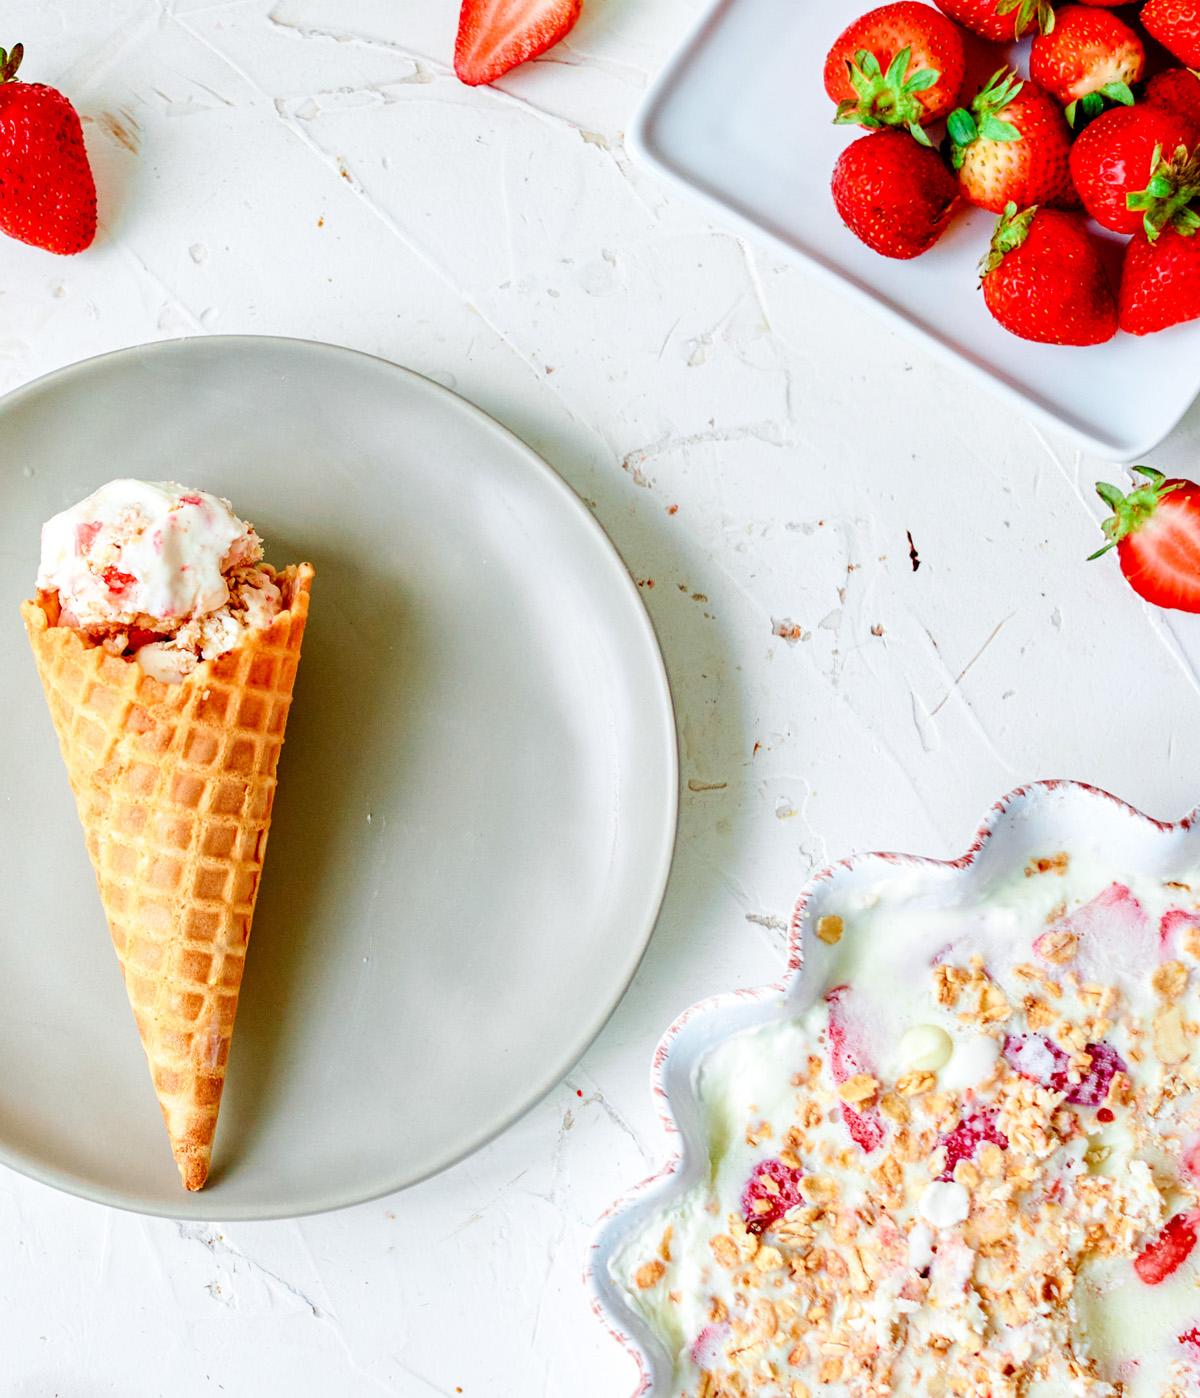 strawberry crumble ice cream cone and bowl